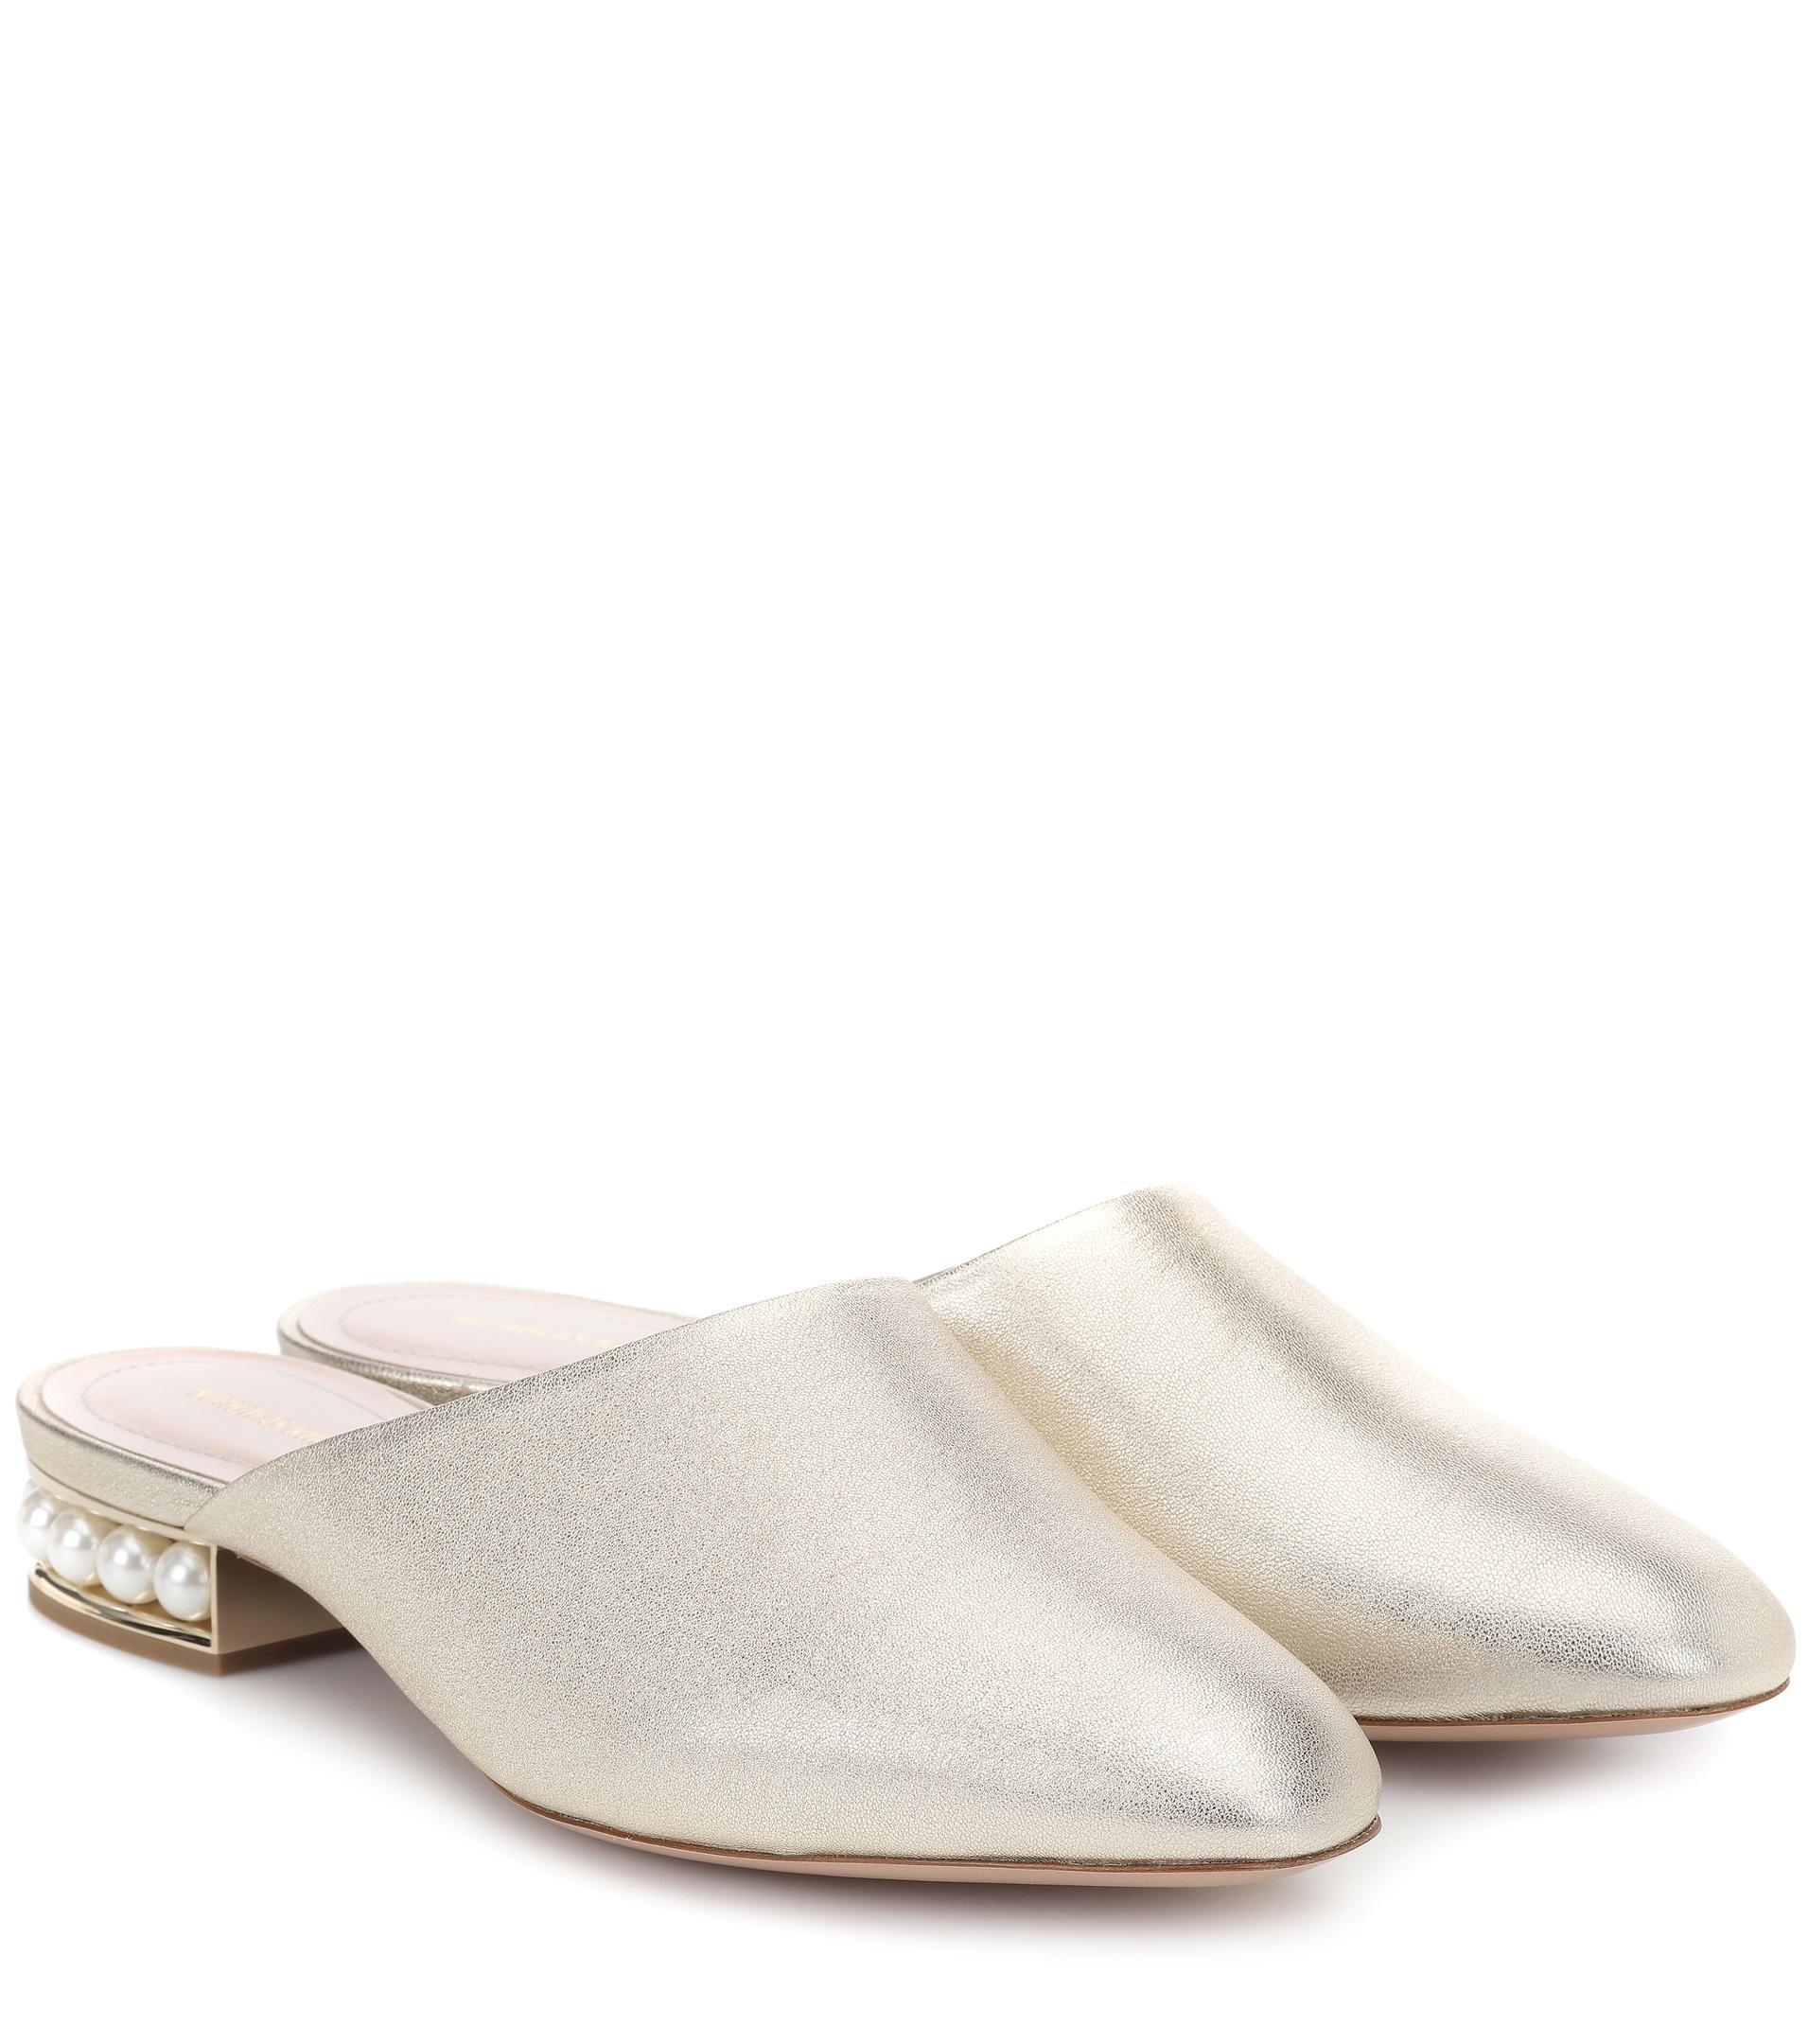 Nicholas Kirkwood Casati metallic leather slippers Professional ruyHMKU